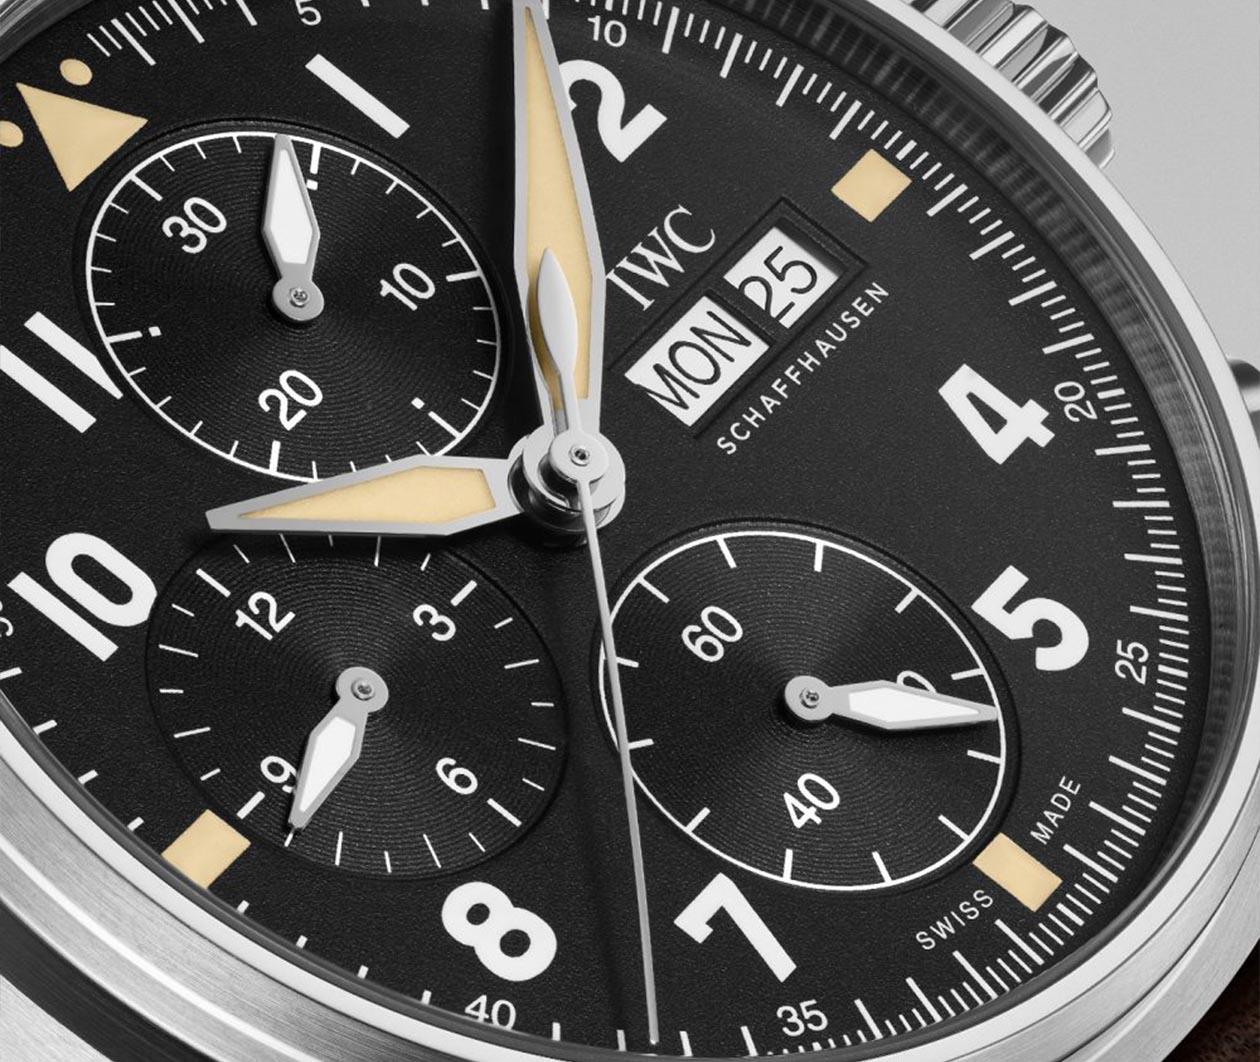 IWC PilotsWatch ChronographSpitfire IW387903 Carousel 4 FINAL